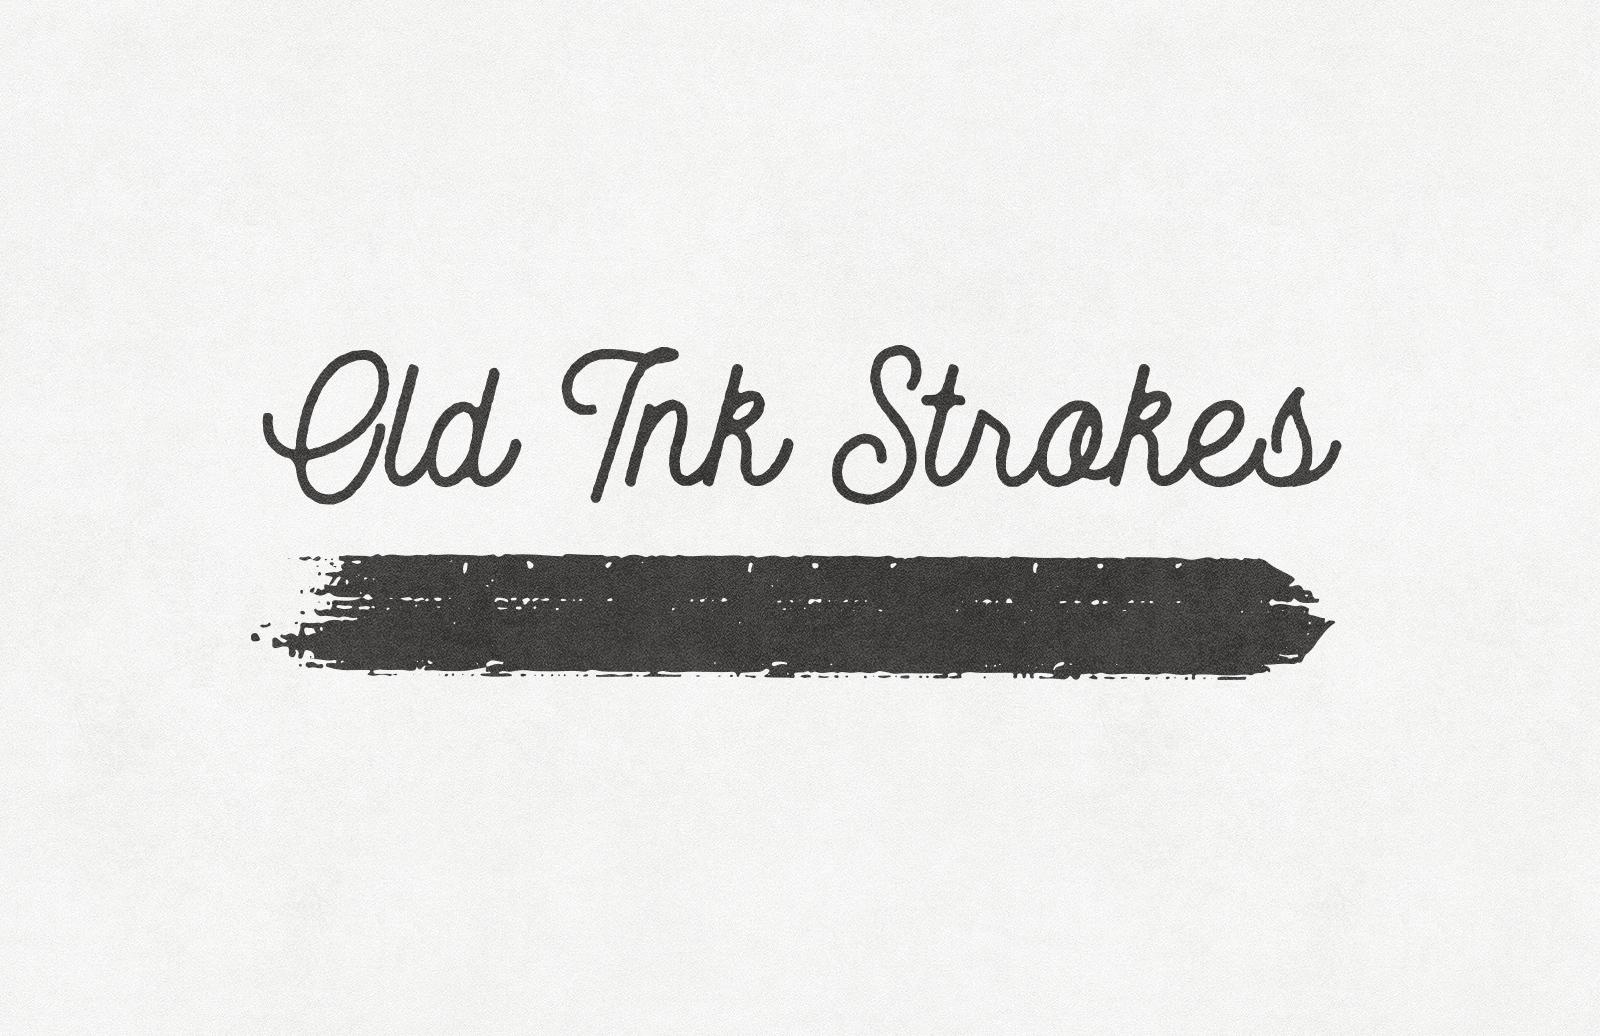 Old Ink Strokes – Illustrator Brushes